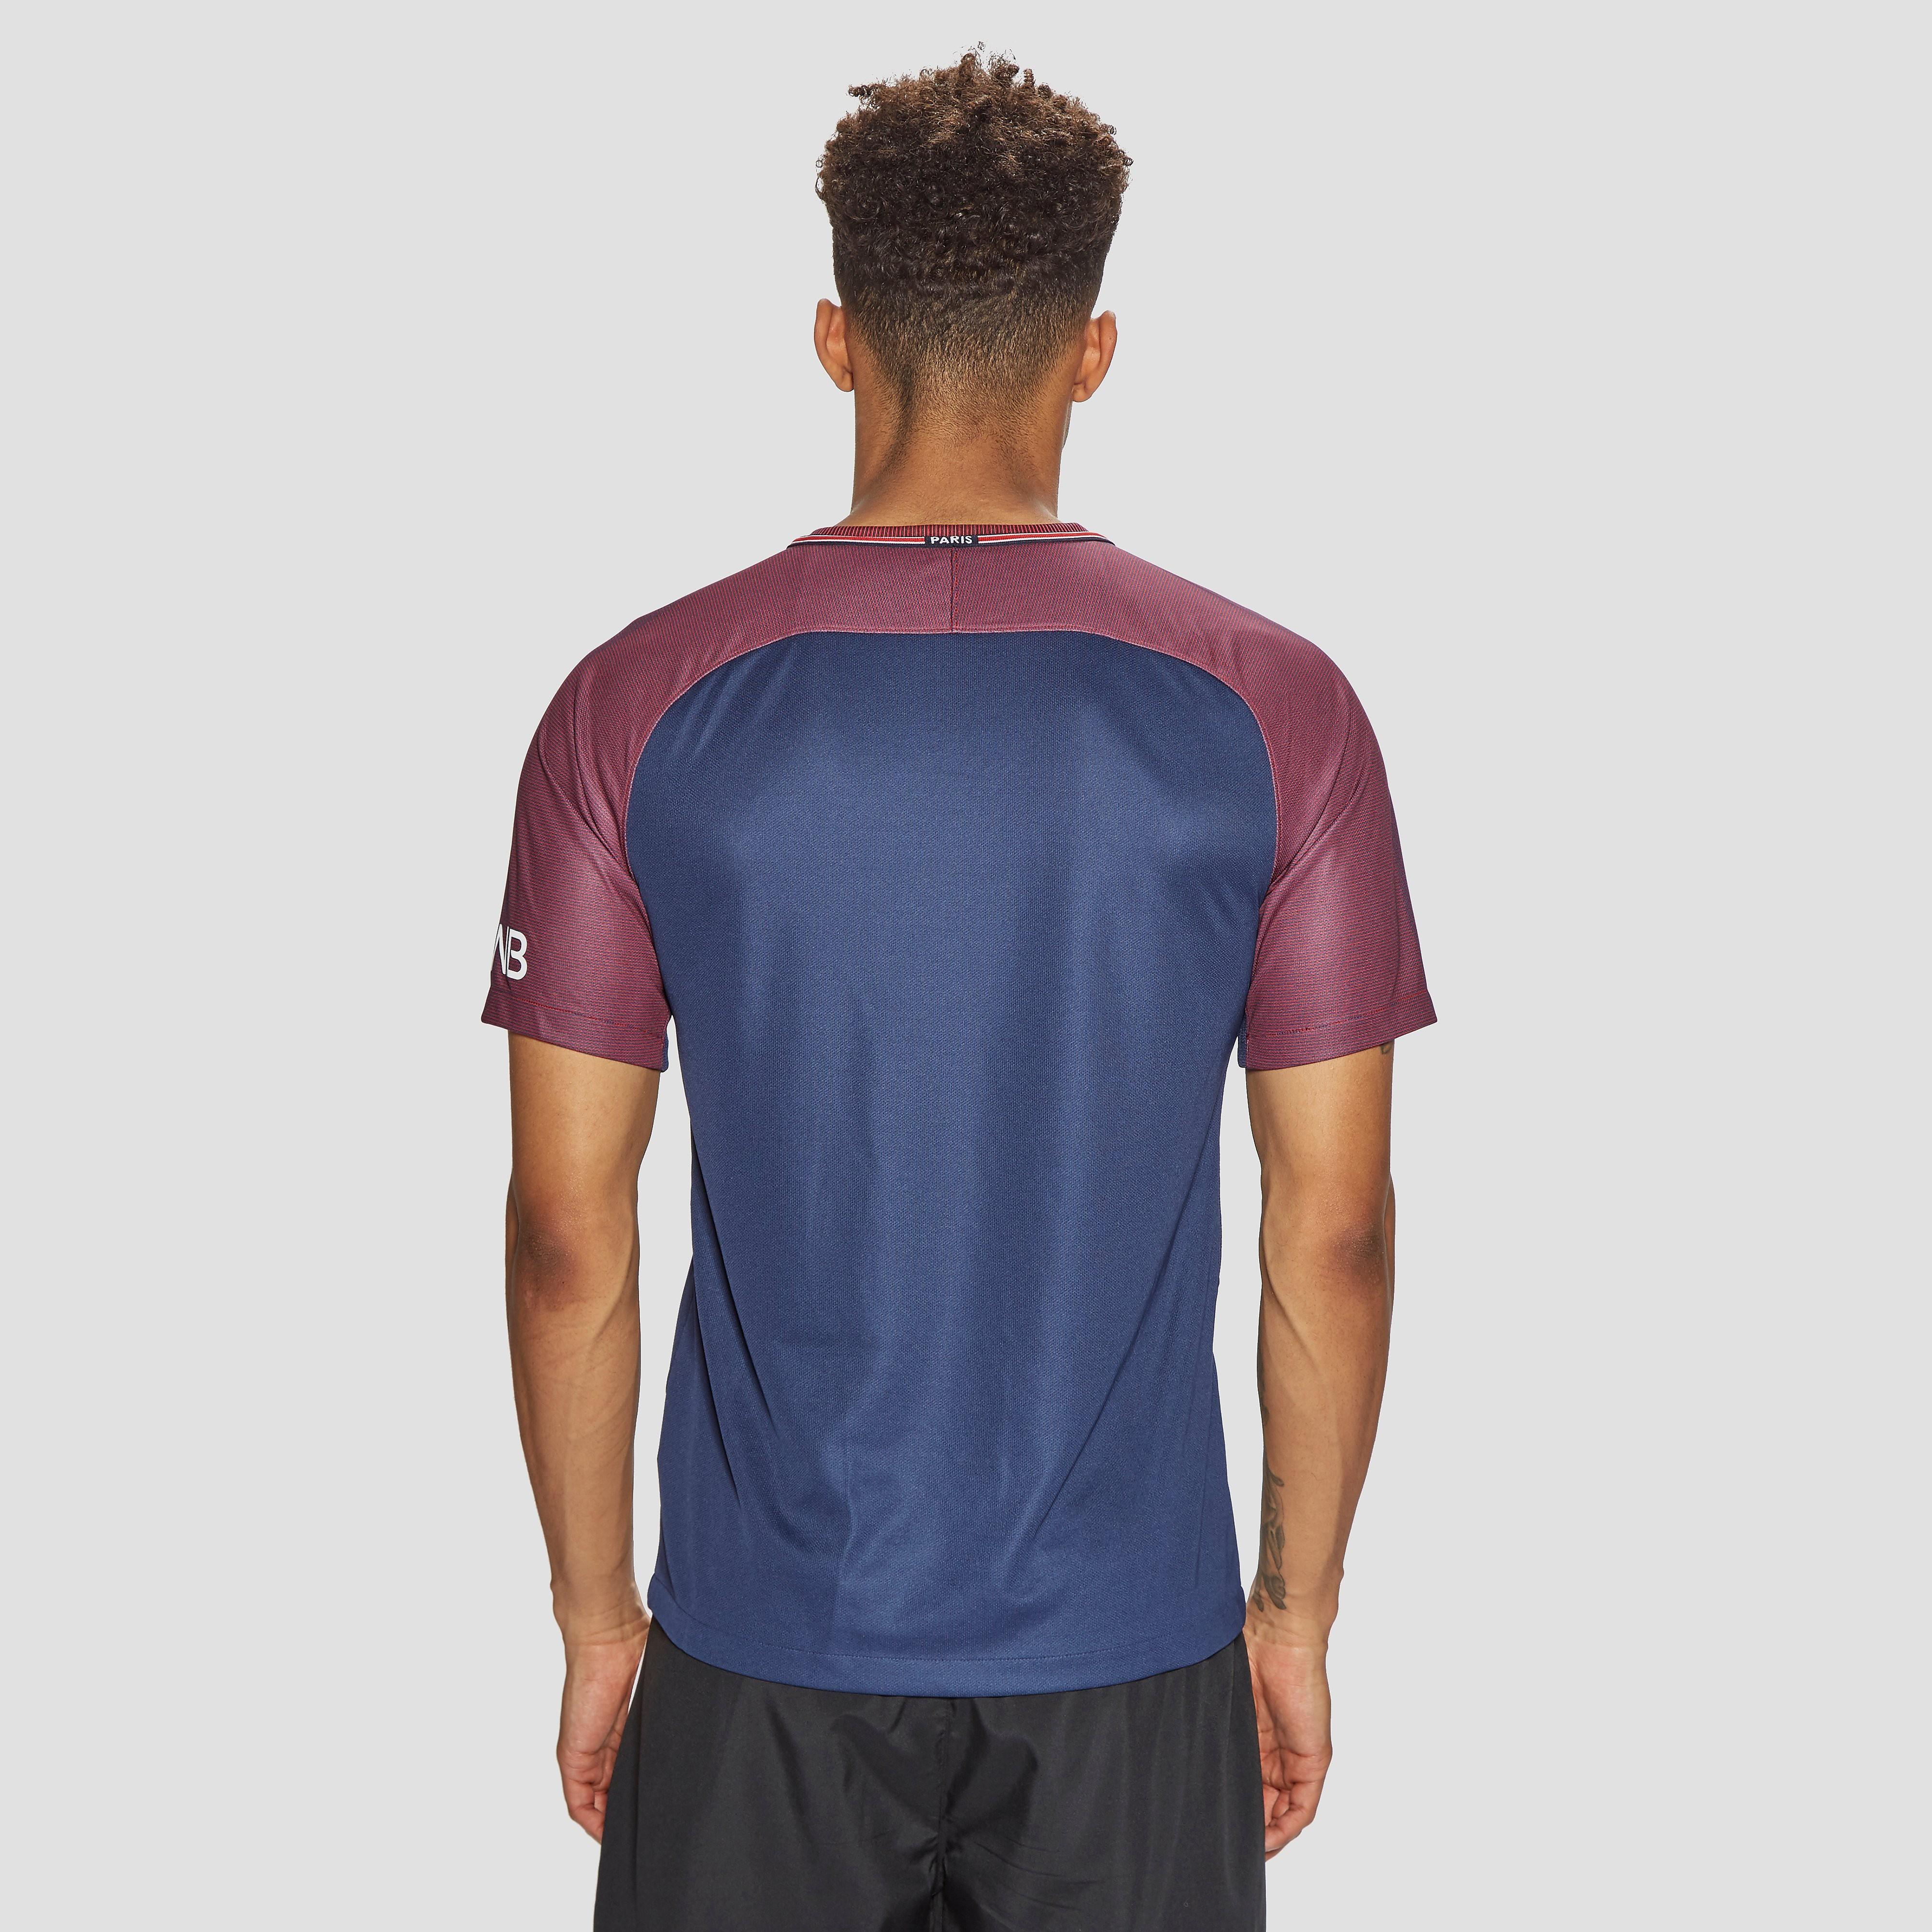 Nike Paris Saint Germain 2017/18 Men's Home Shirt